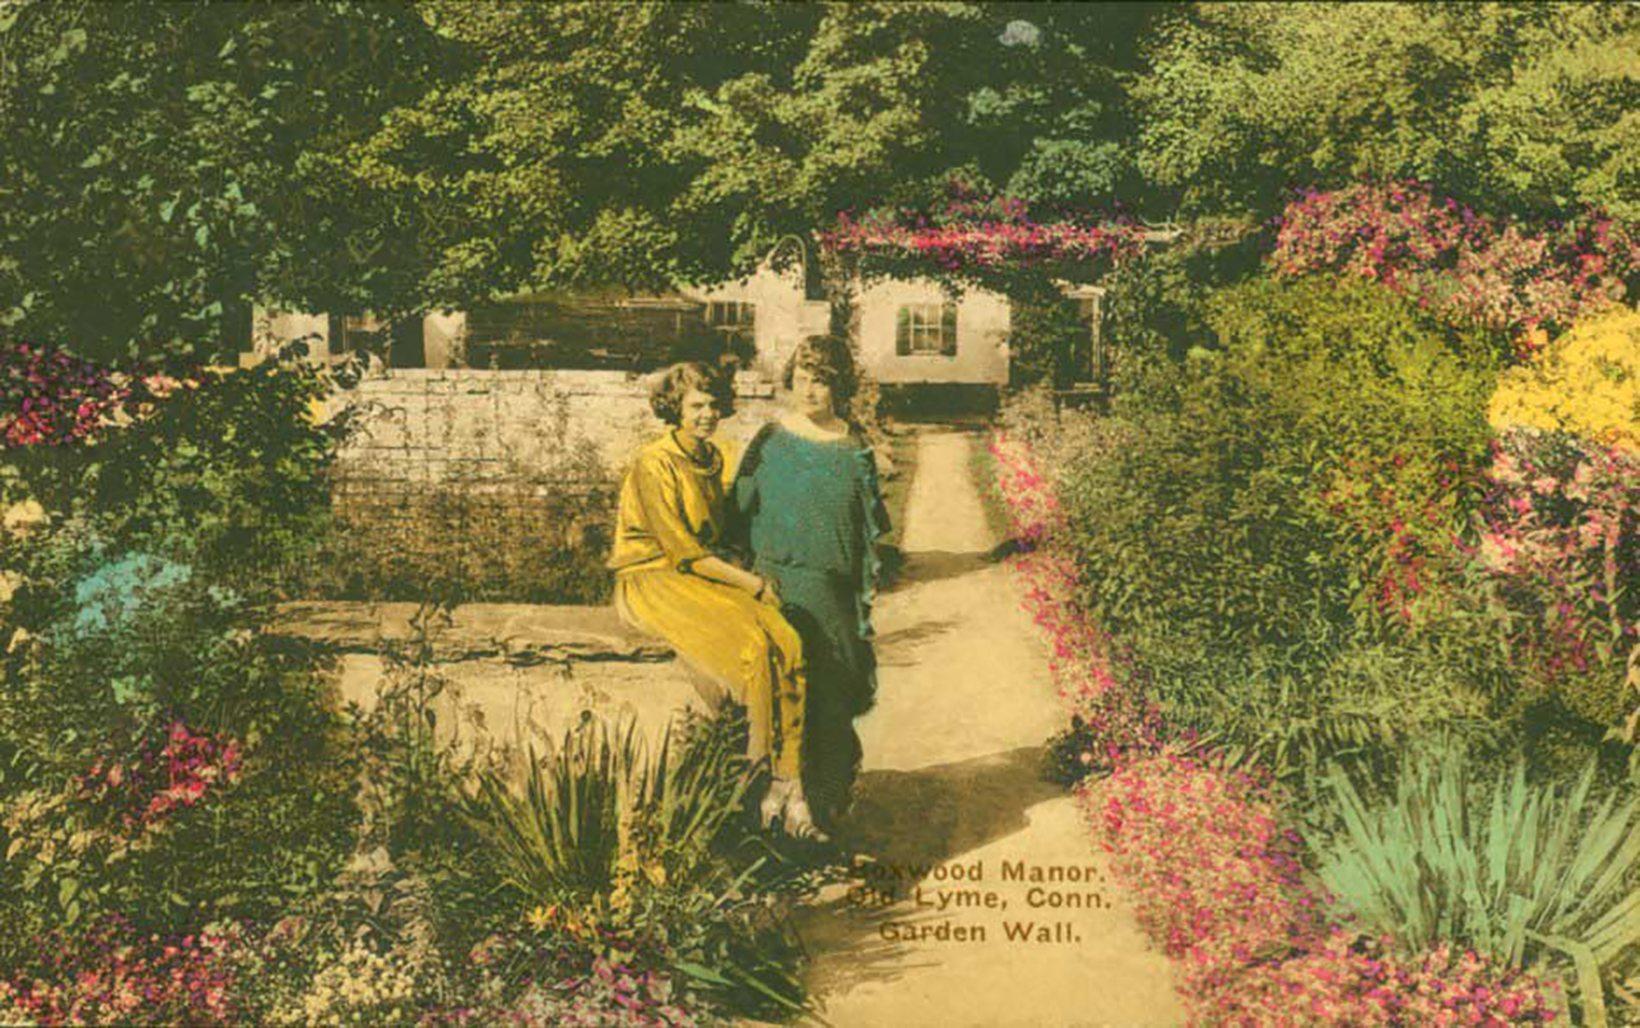 Landmarks: Painted Gardens, Part 1- Boxwood Manor